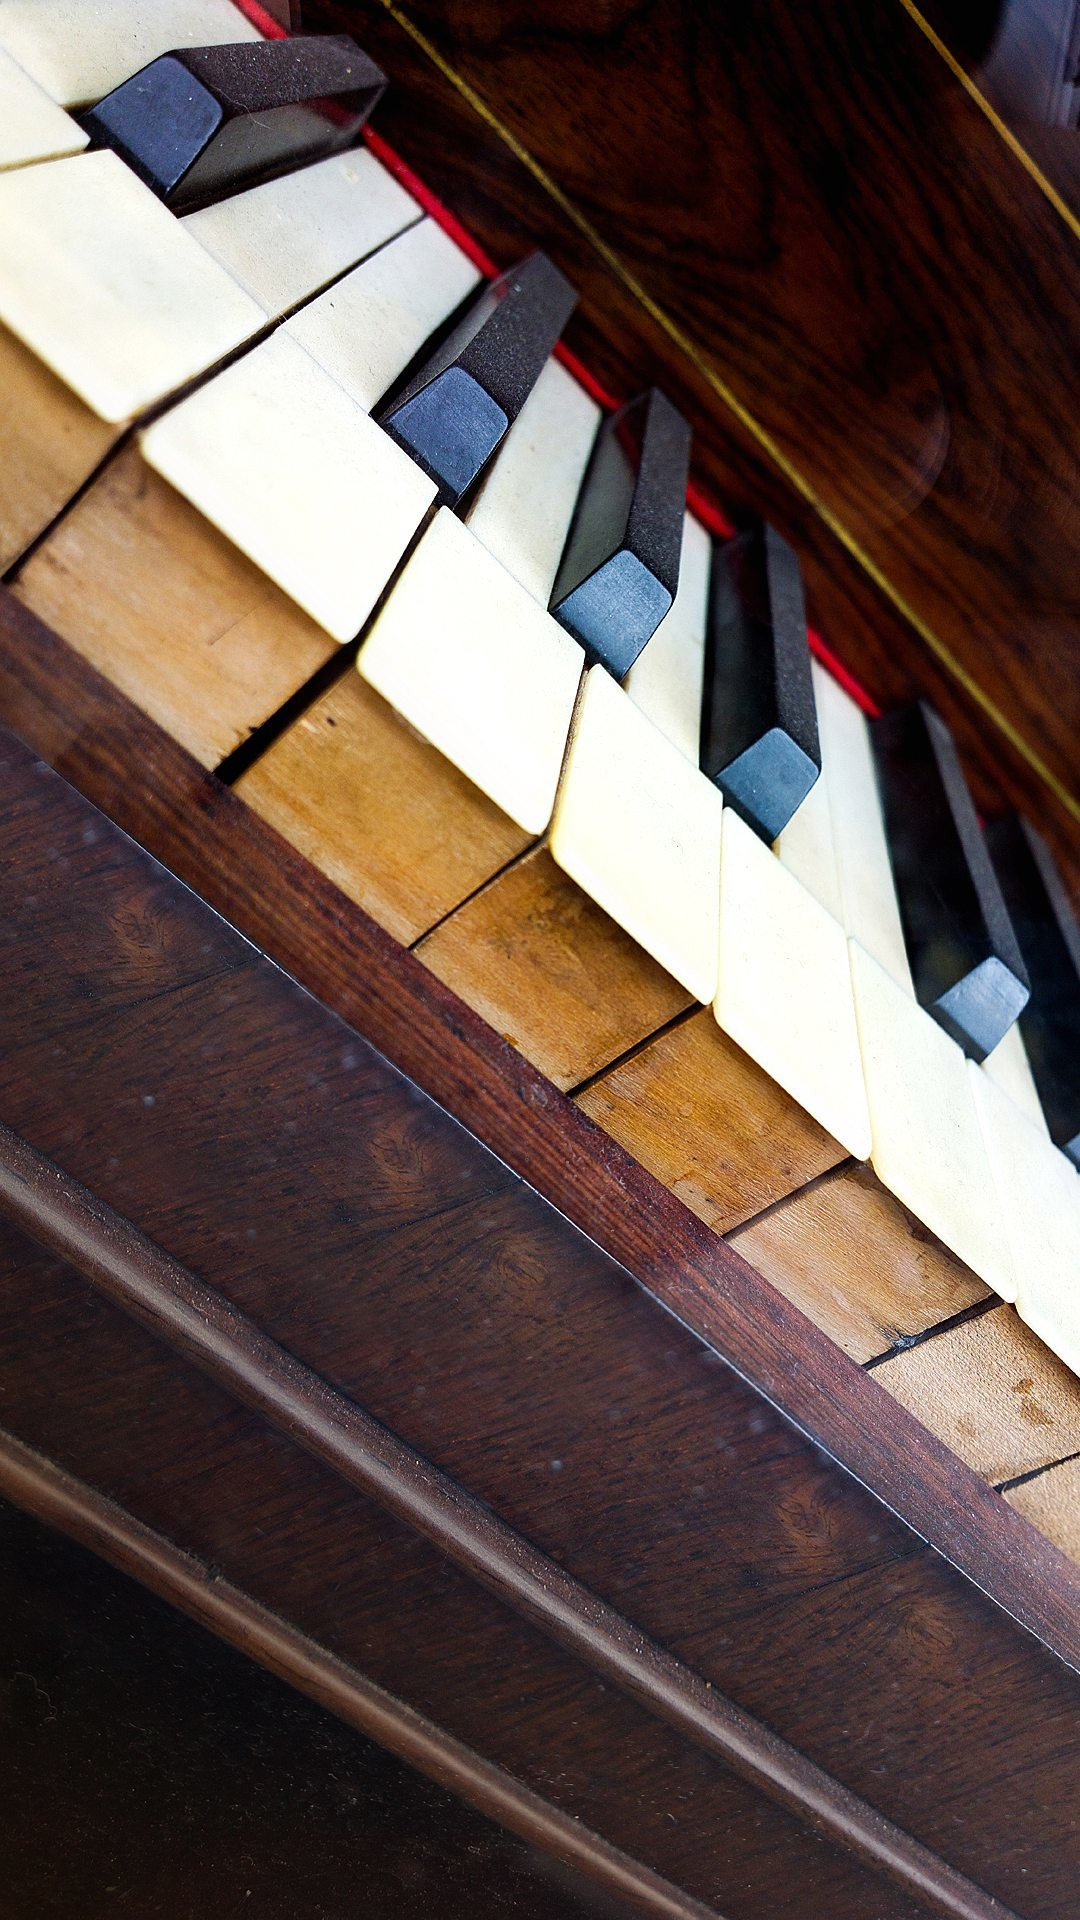 Old Piano Keys Android Wallpaper …